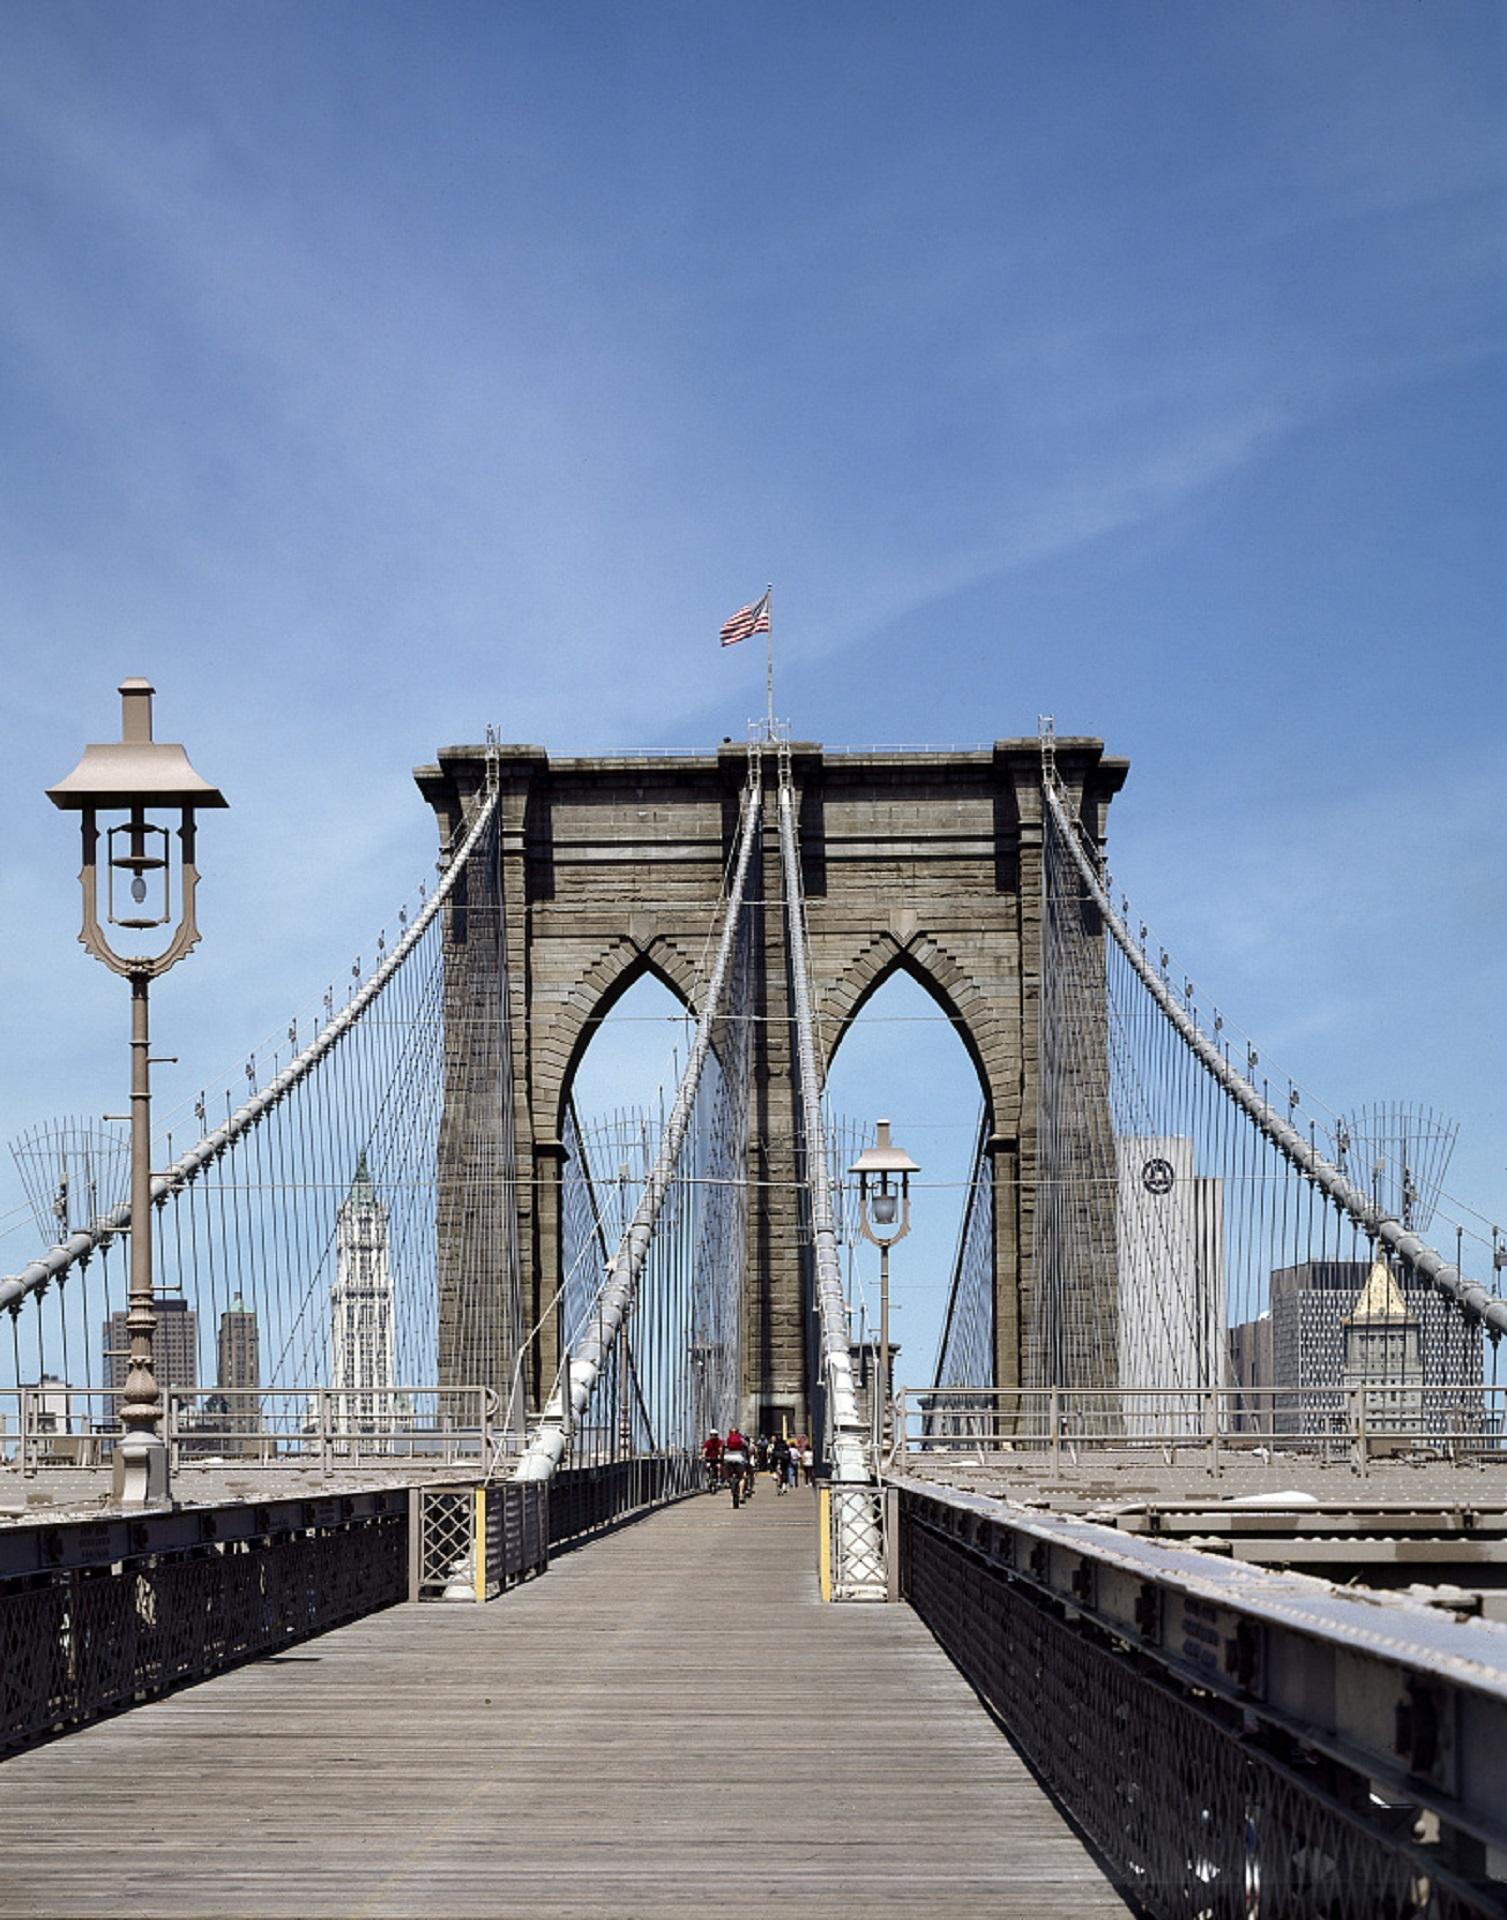 Brooklyn Bridge, Architecture, Bridge, Brooklyn, City, HQ Photo